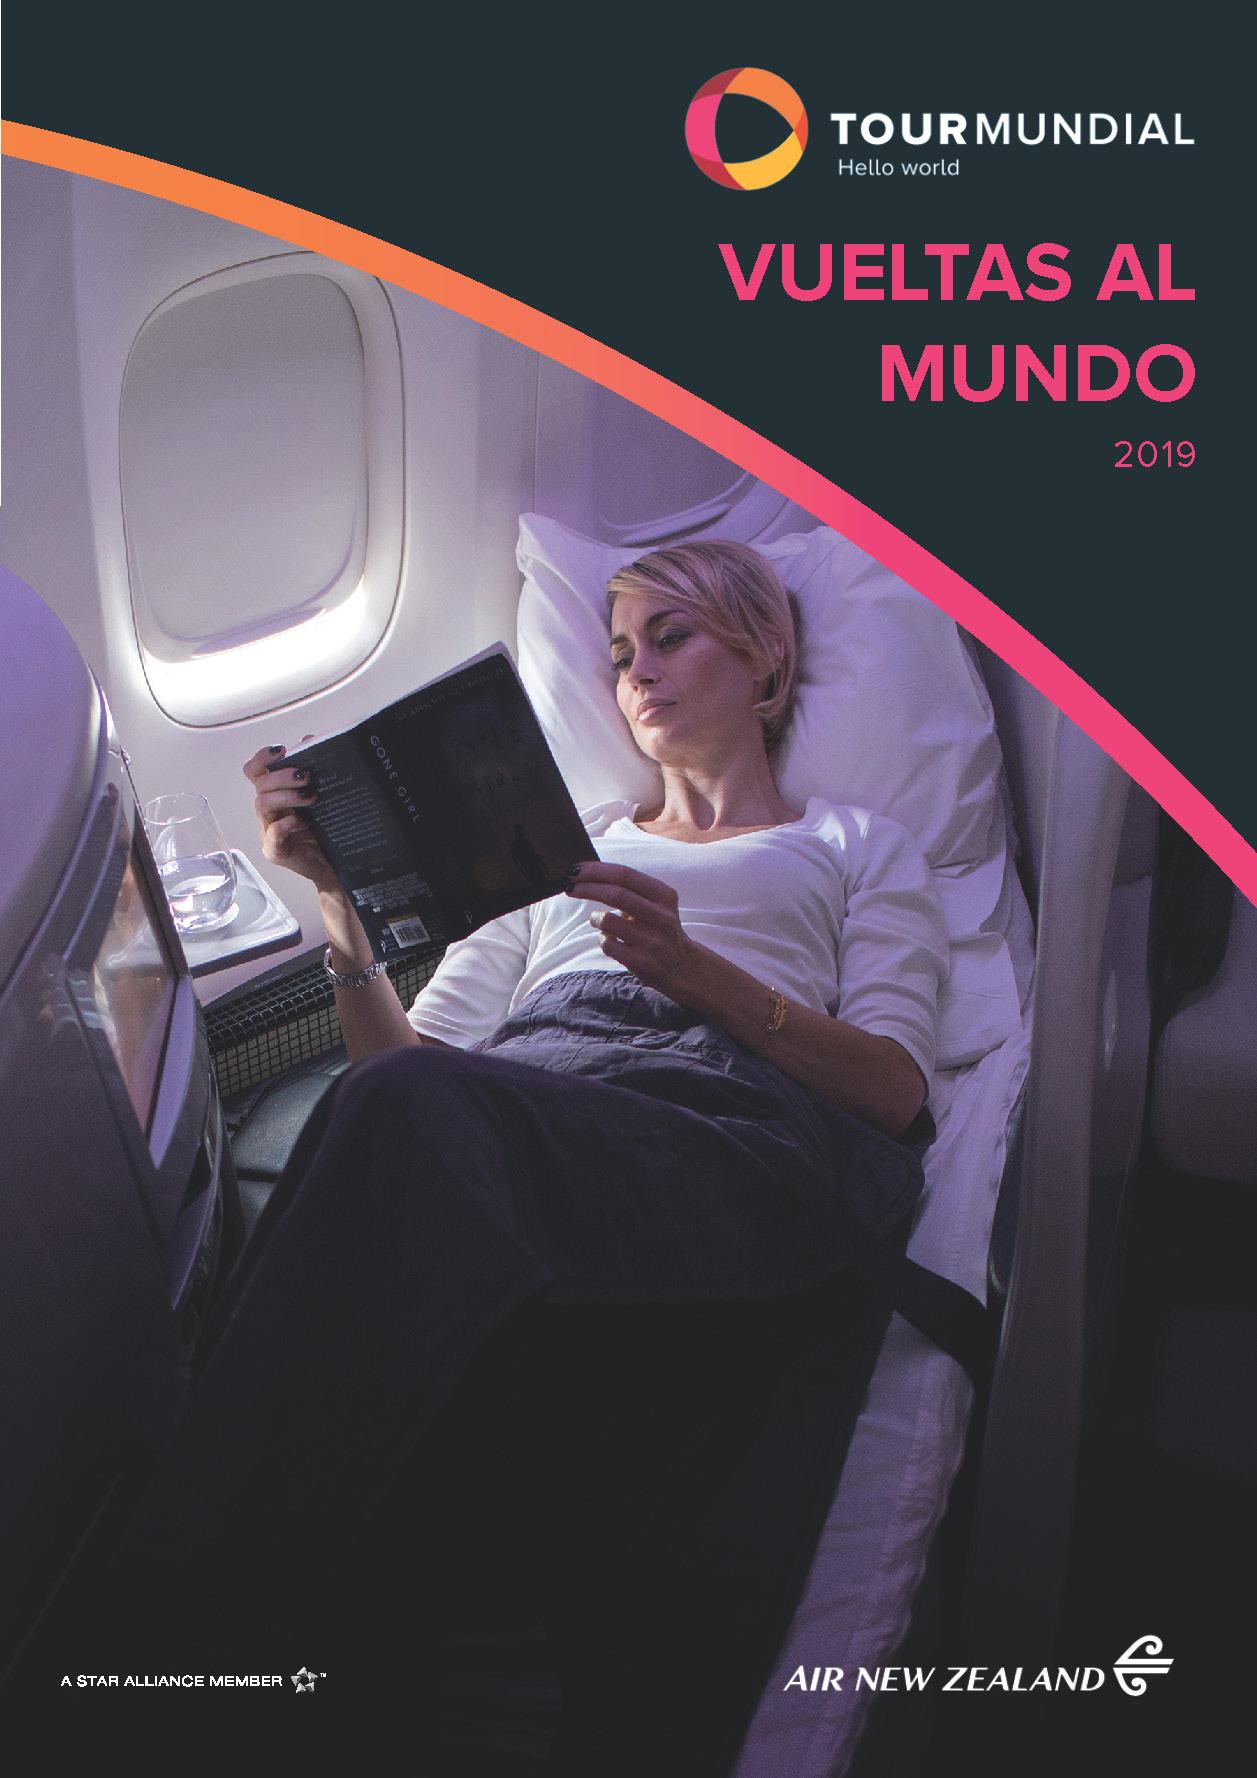 Catalogo Tourmundial Vueltas al Mundo 2019